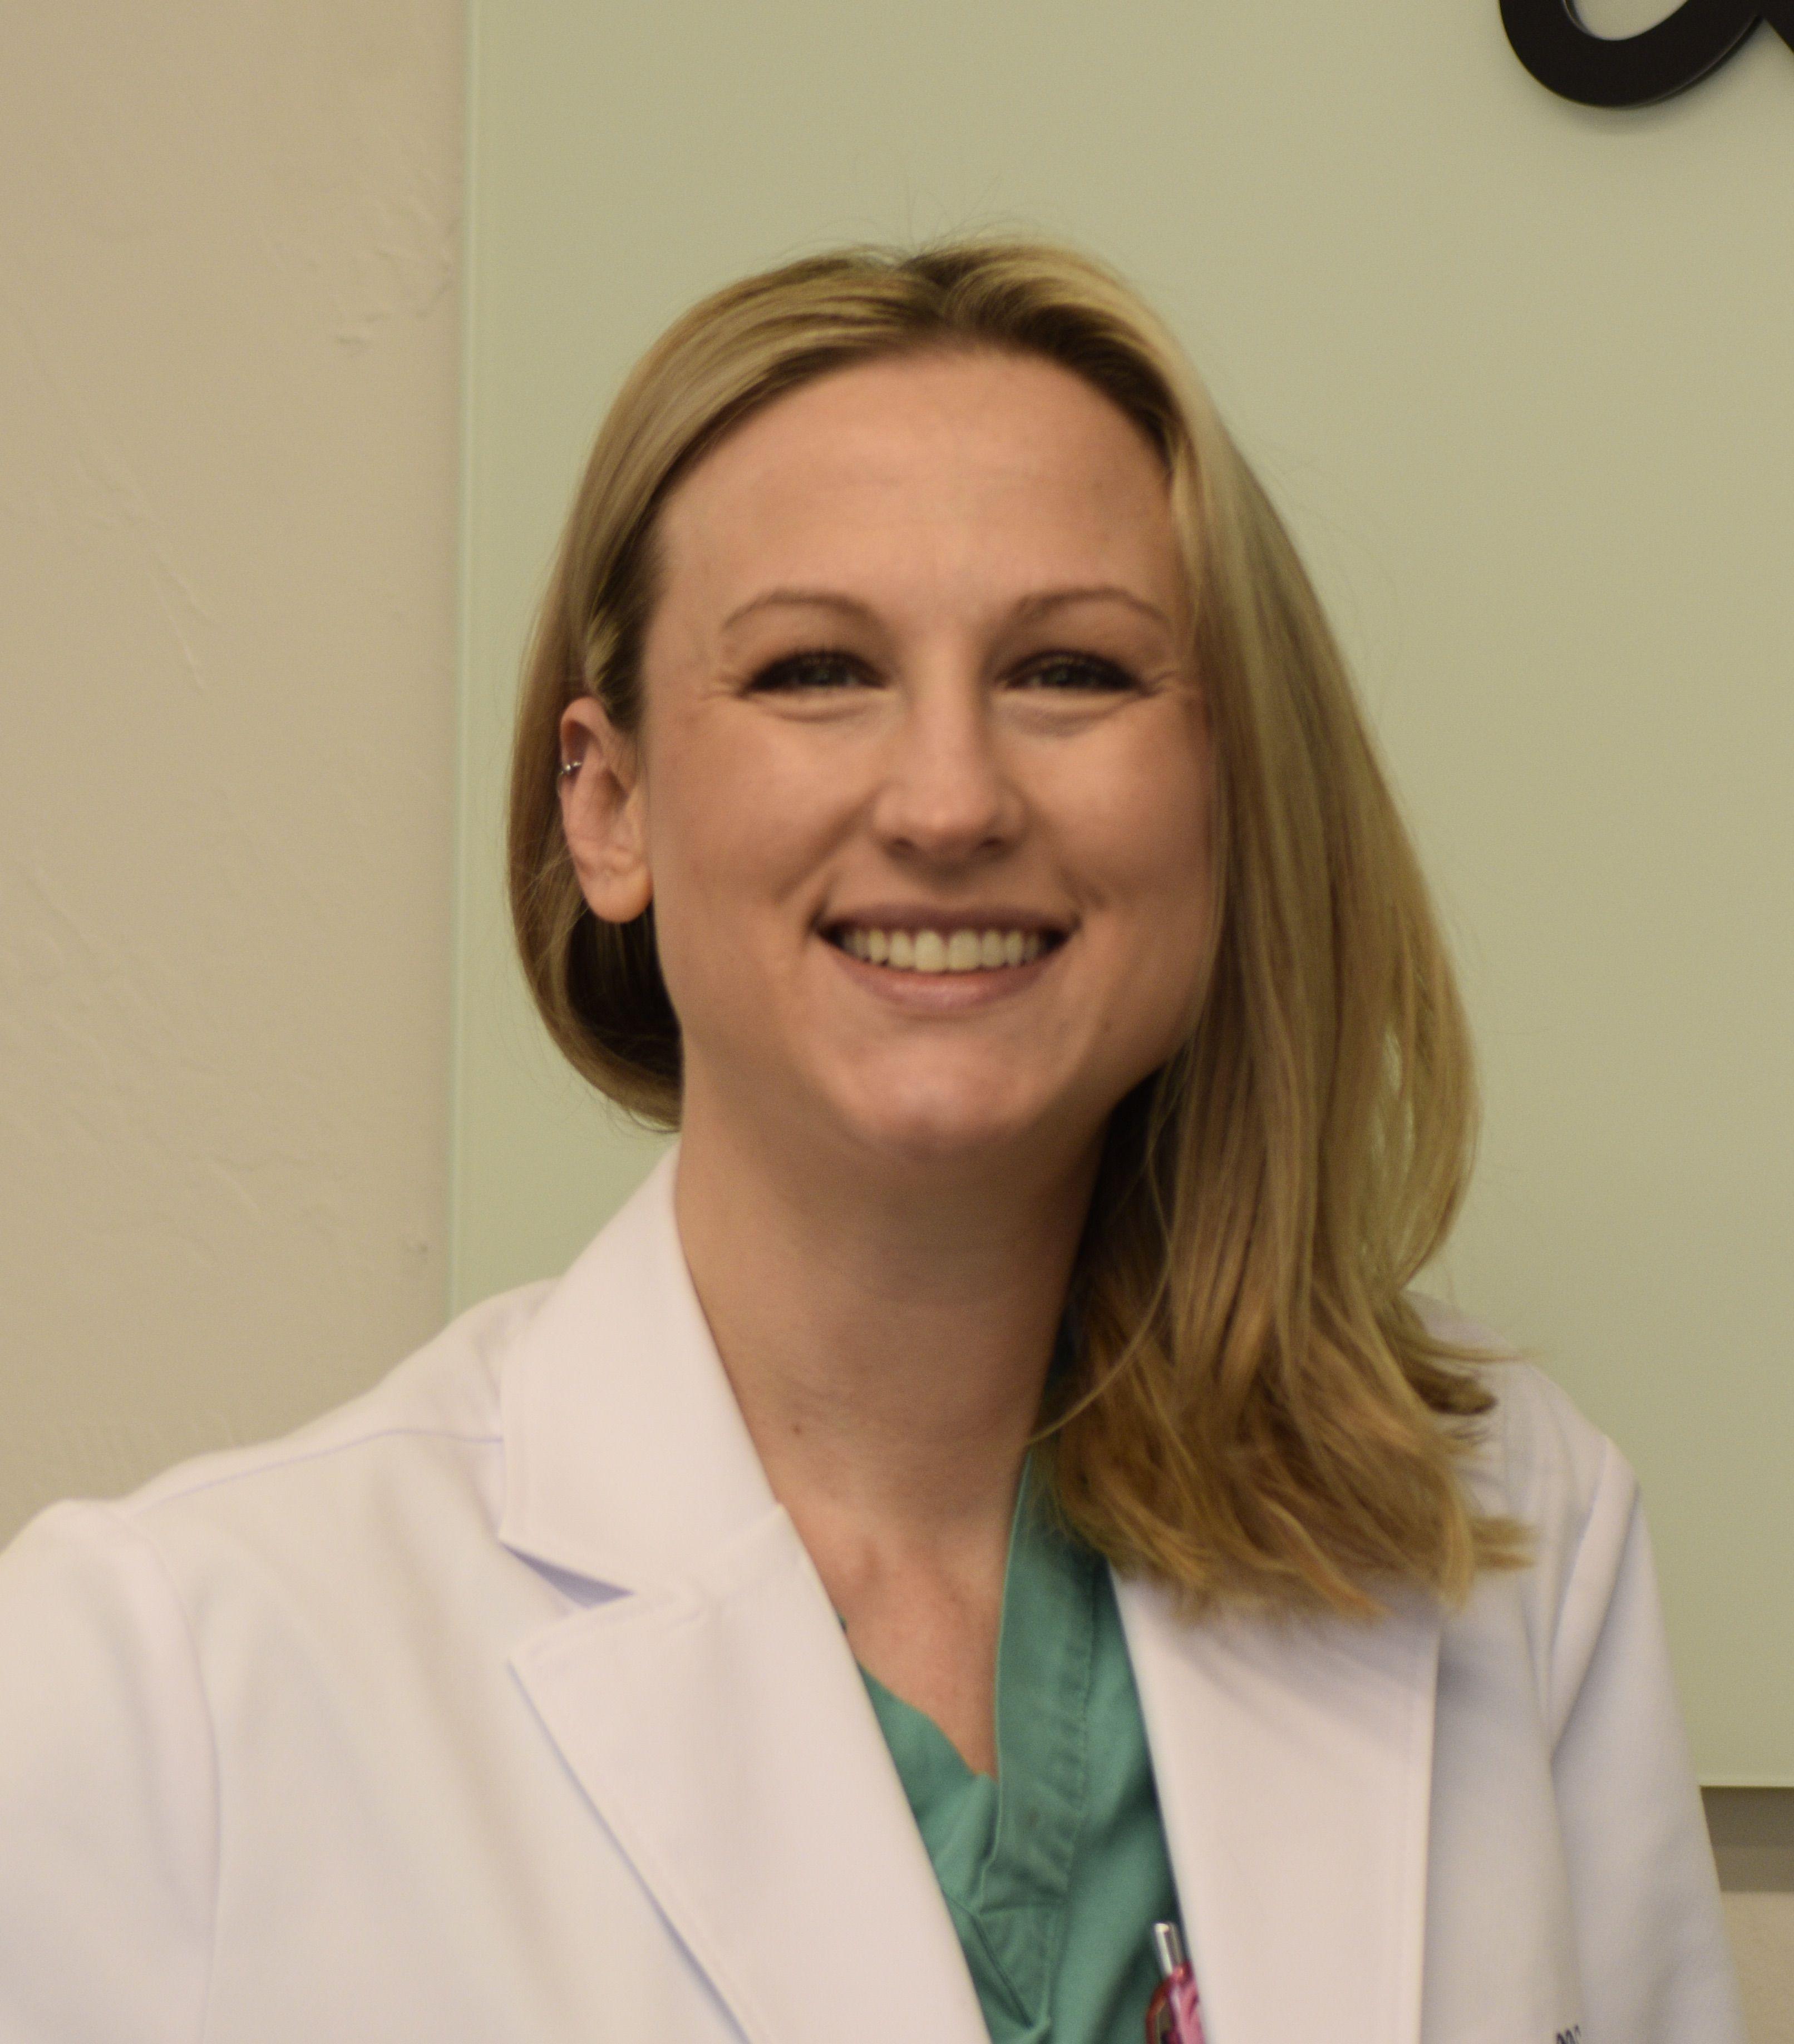 Dr Kari Blankenship